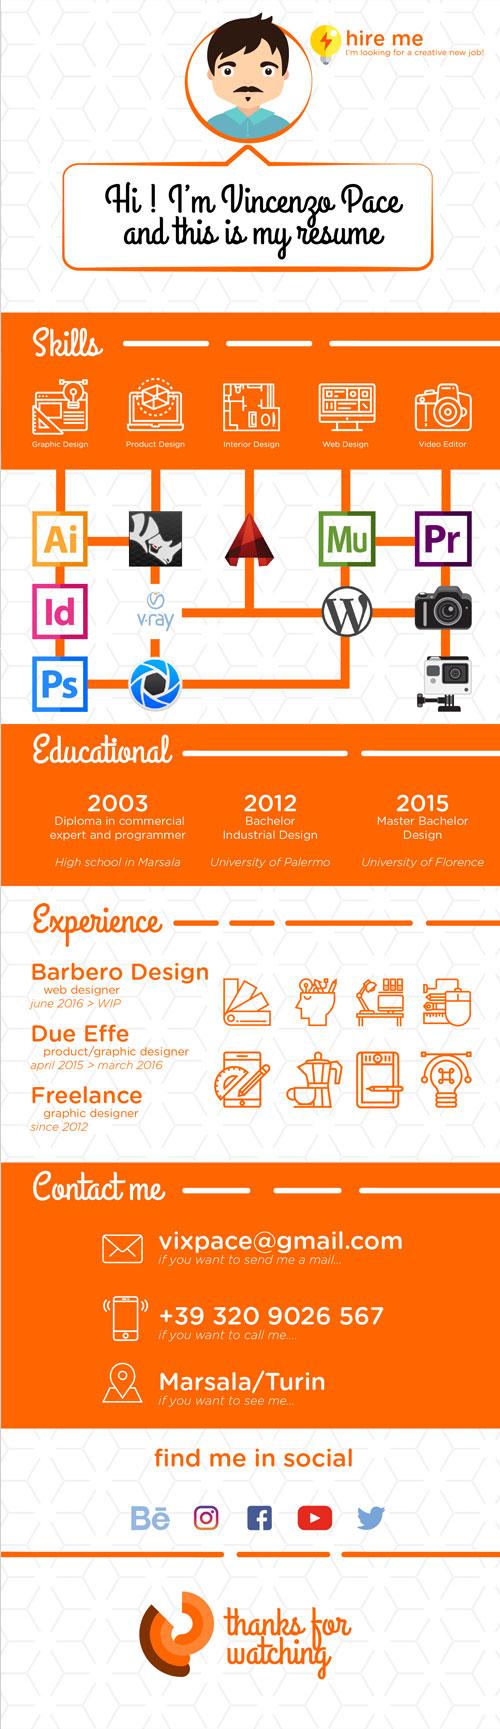 self-promotion-creative-resume-template